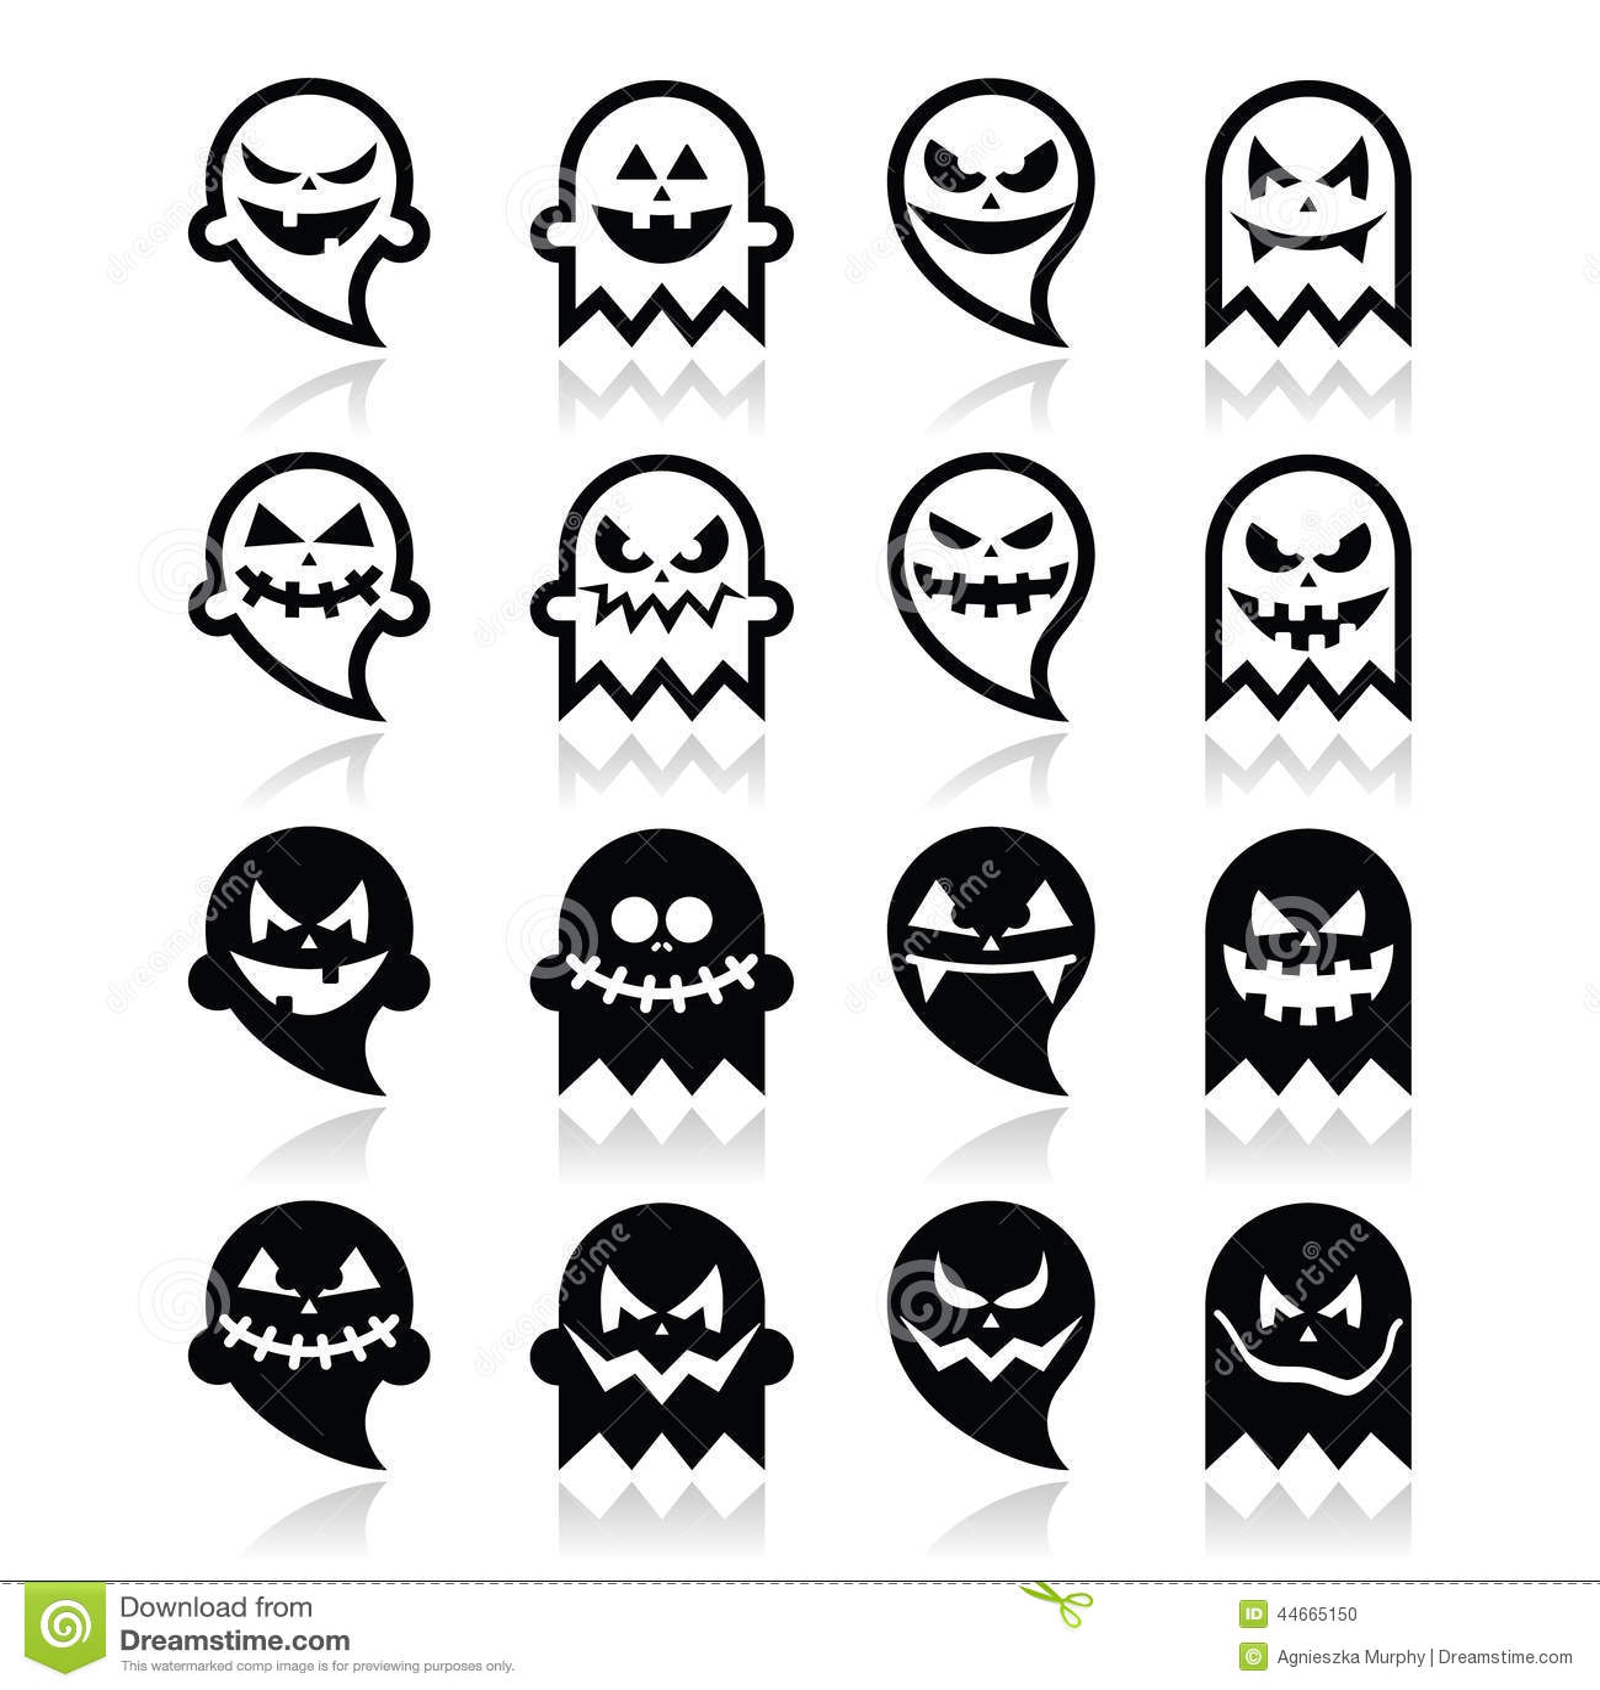 Halloween Scary Ghost Black Icons Set Stock Illustration Image 44665150